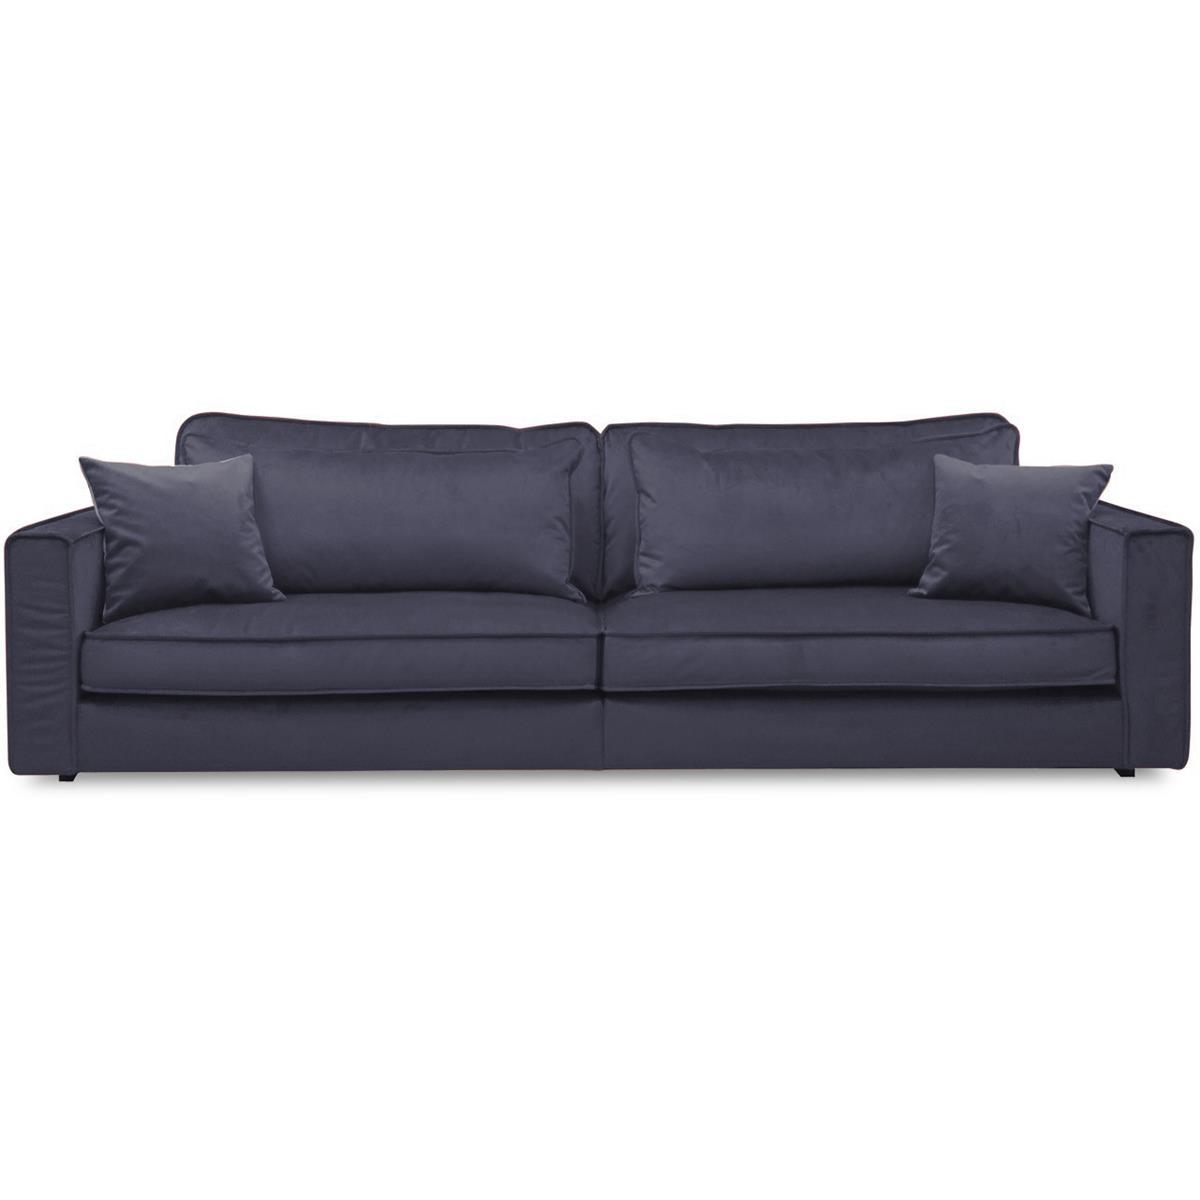 Luca-flintstone-soffa-fasta-ryggkuddar